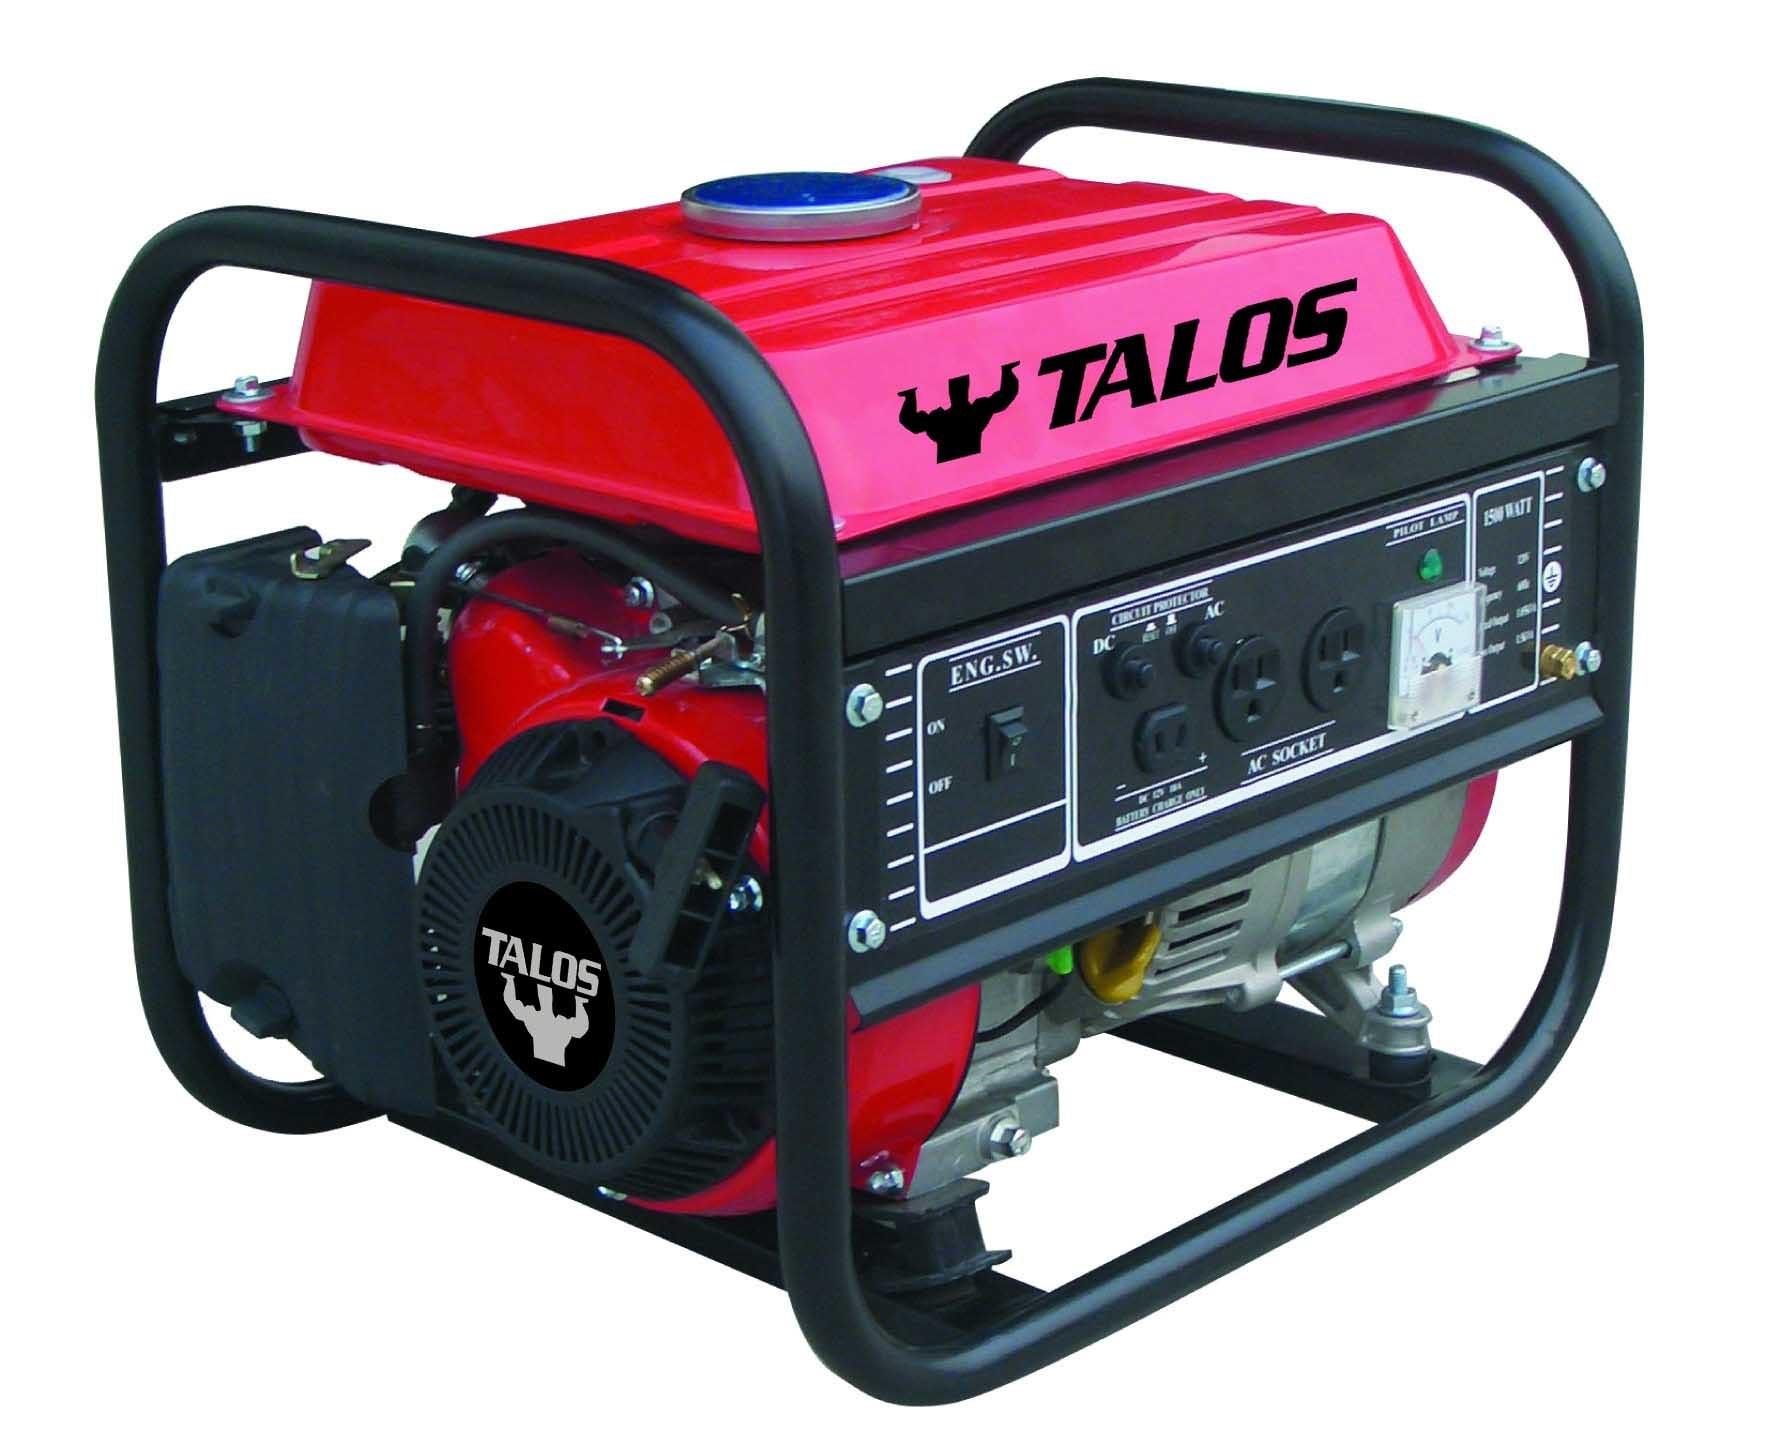 1 kVA Portable Gasoline Power Generator (TG1200)